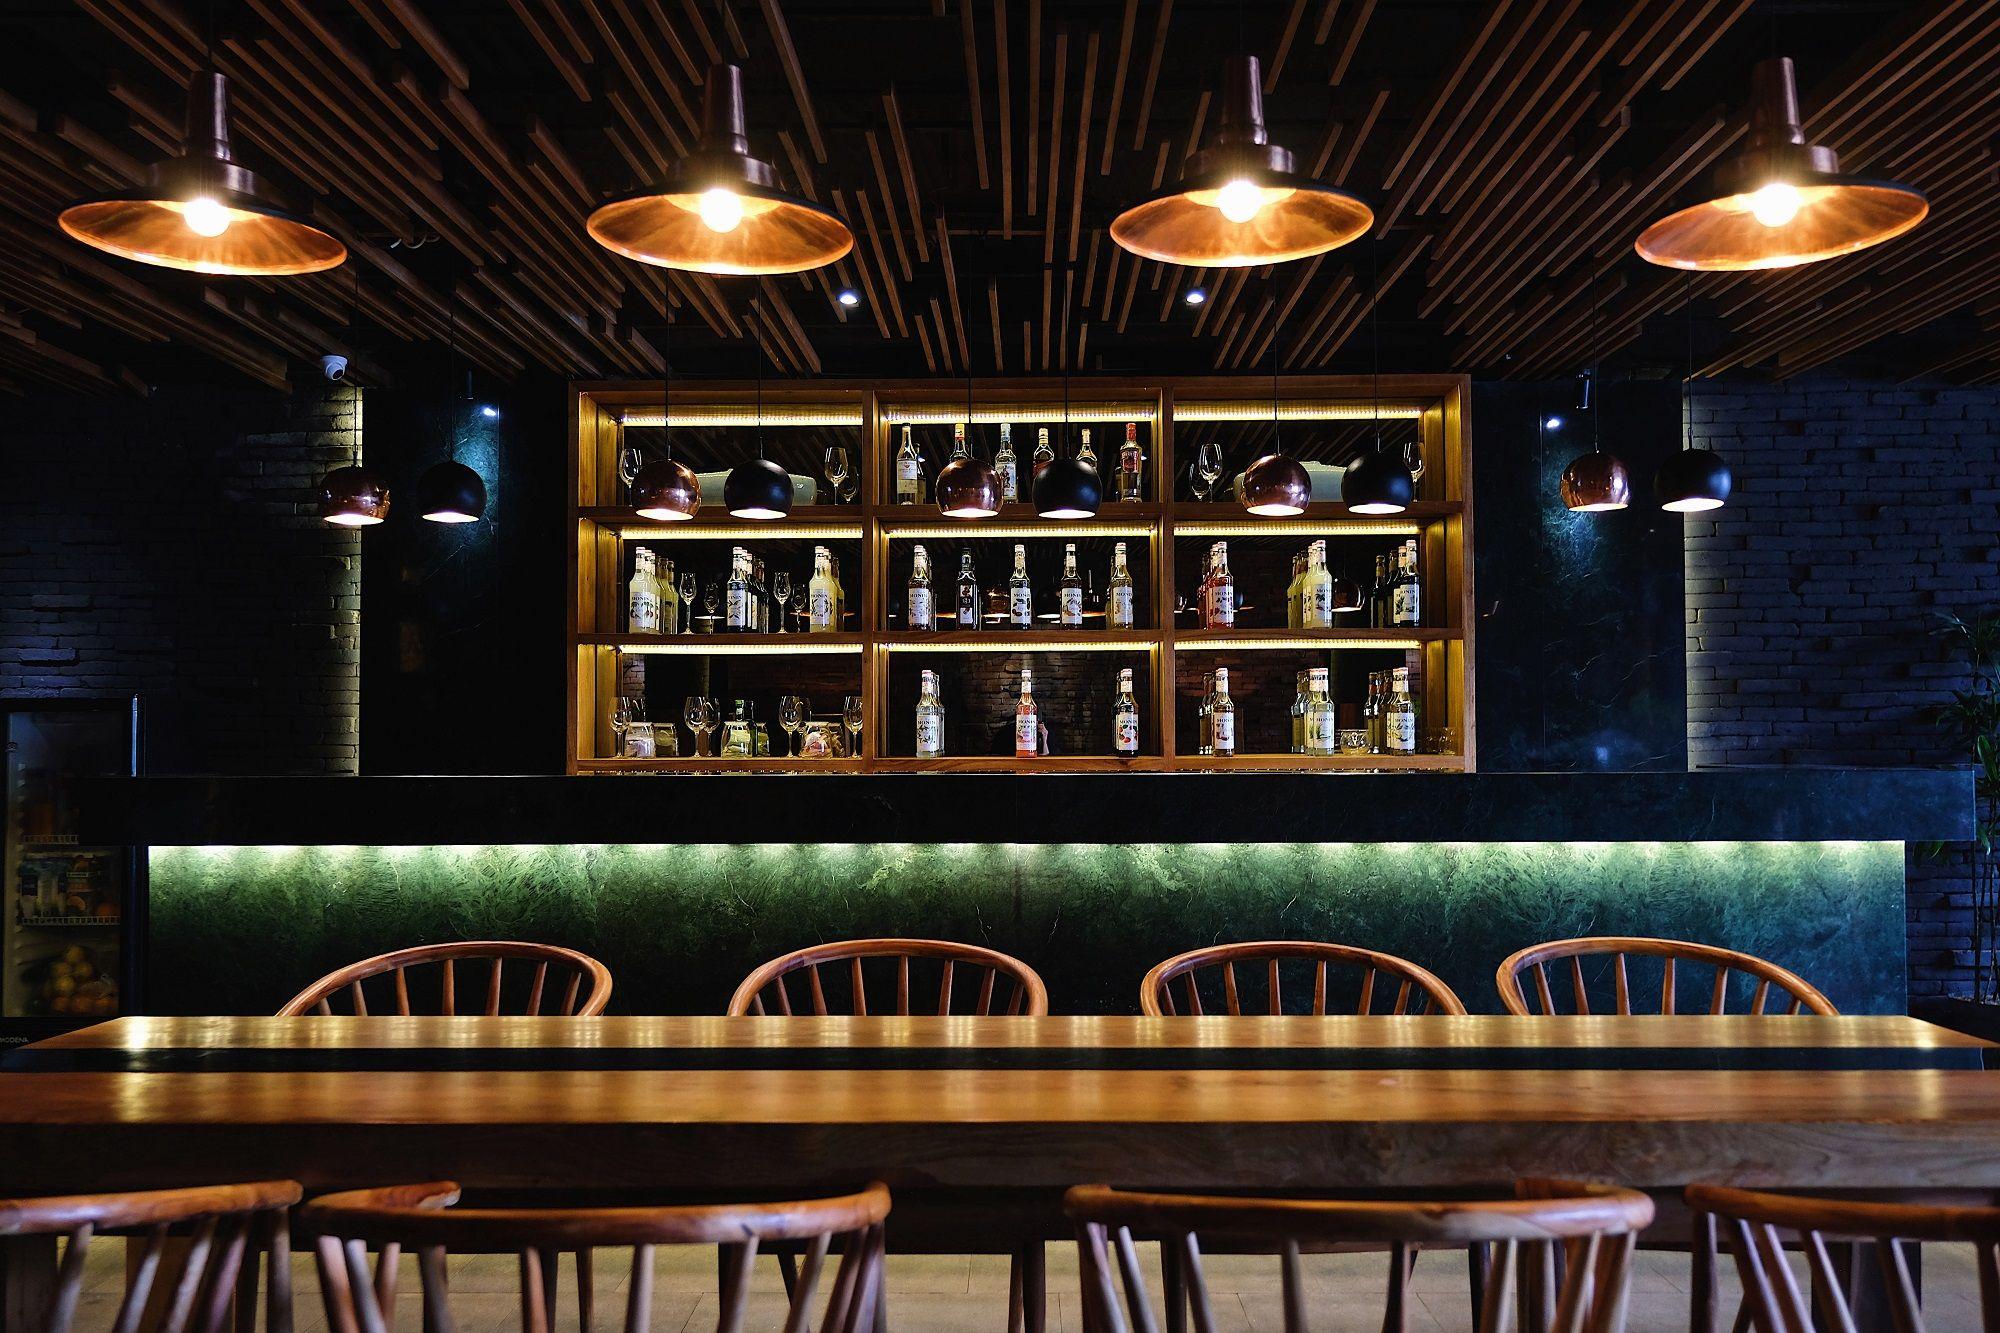 Visavis Kitchen & Bar